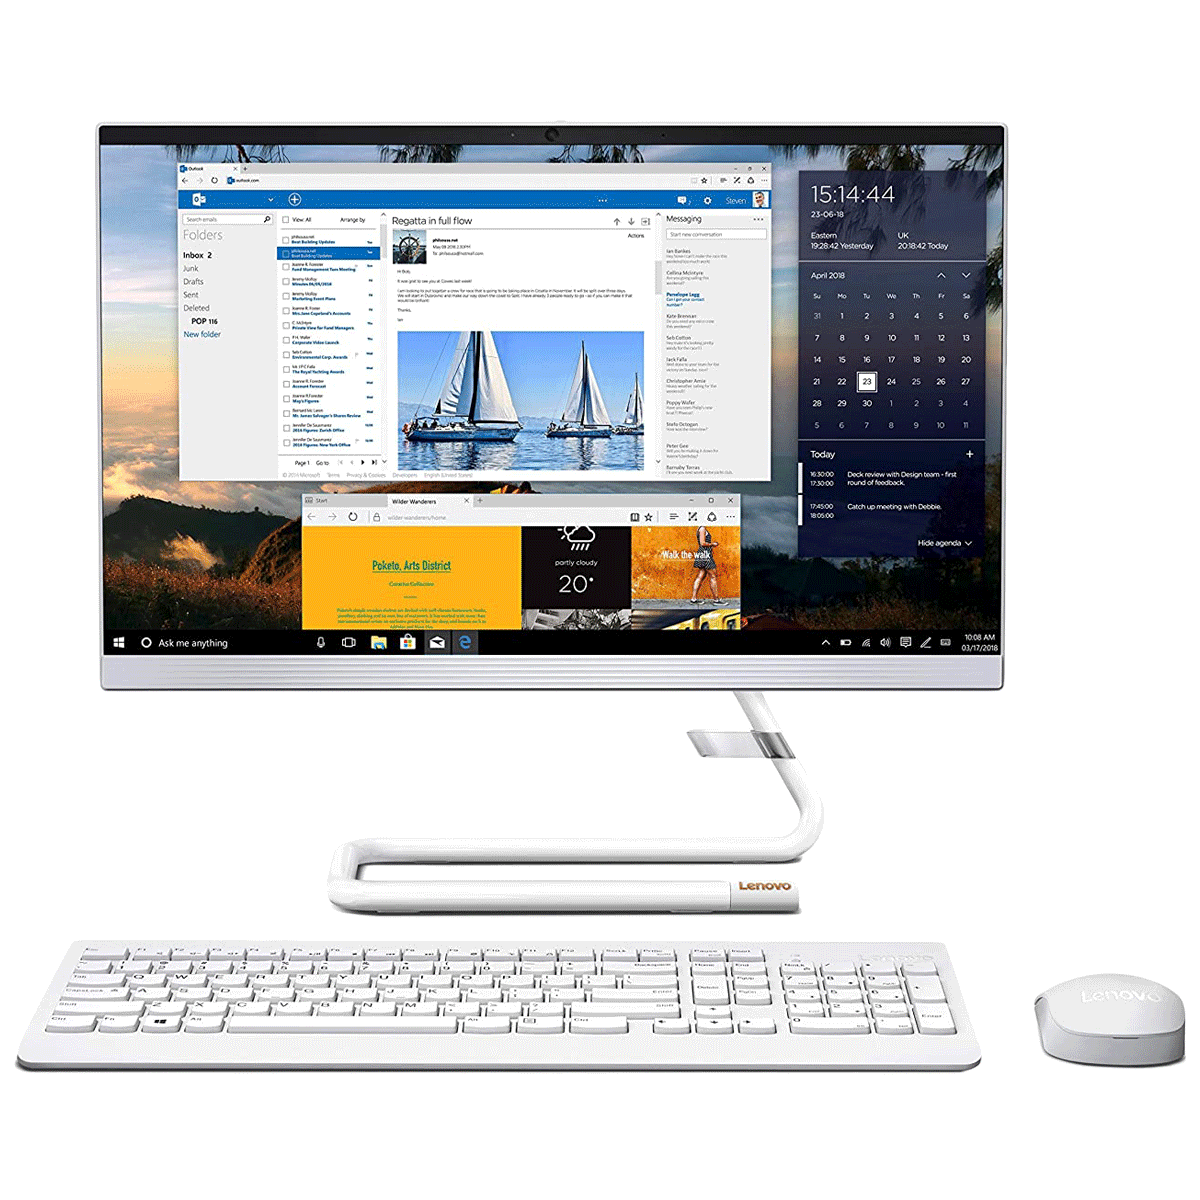 Lenovo IdeaCentre AIO 3 (F0EX0082IN) Ryzen 3 Windows 10 Home All-in-One Desktop (8GB RAM, 1TB HDD, AMD Radeon Graphics, MS Office, 54.61cm, Foggy White)